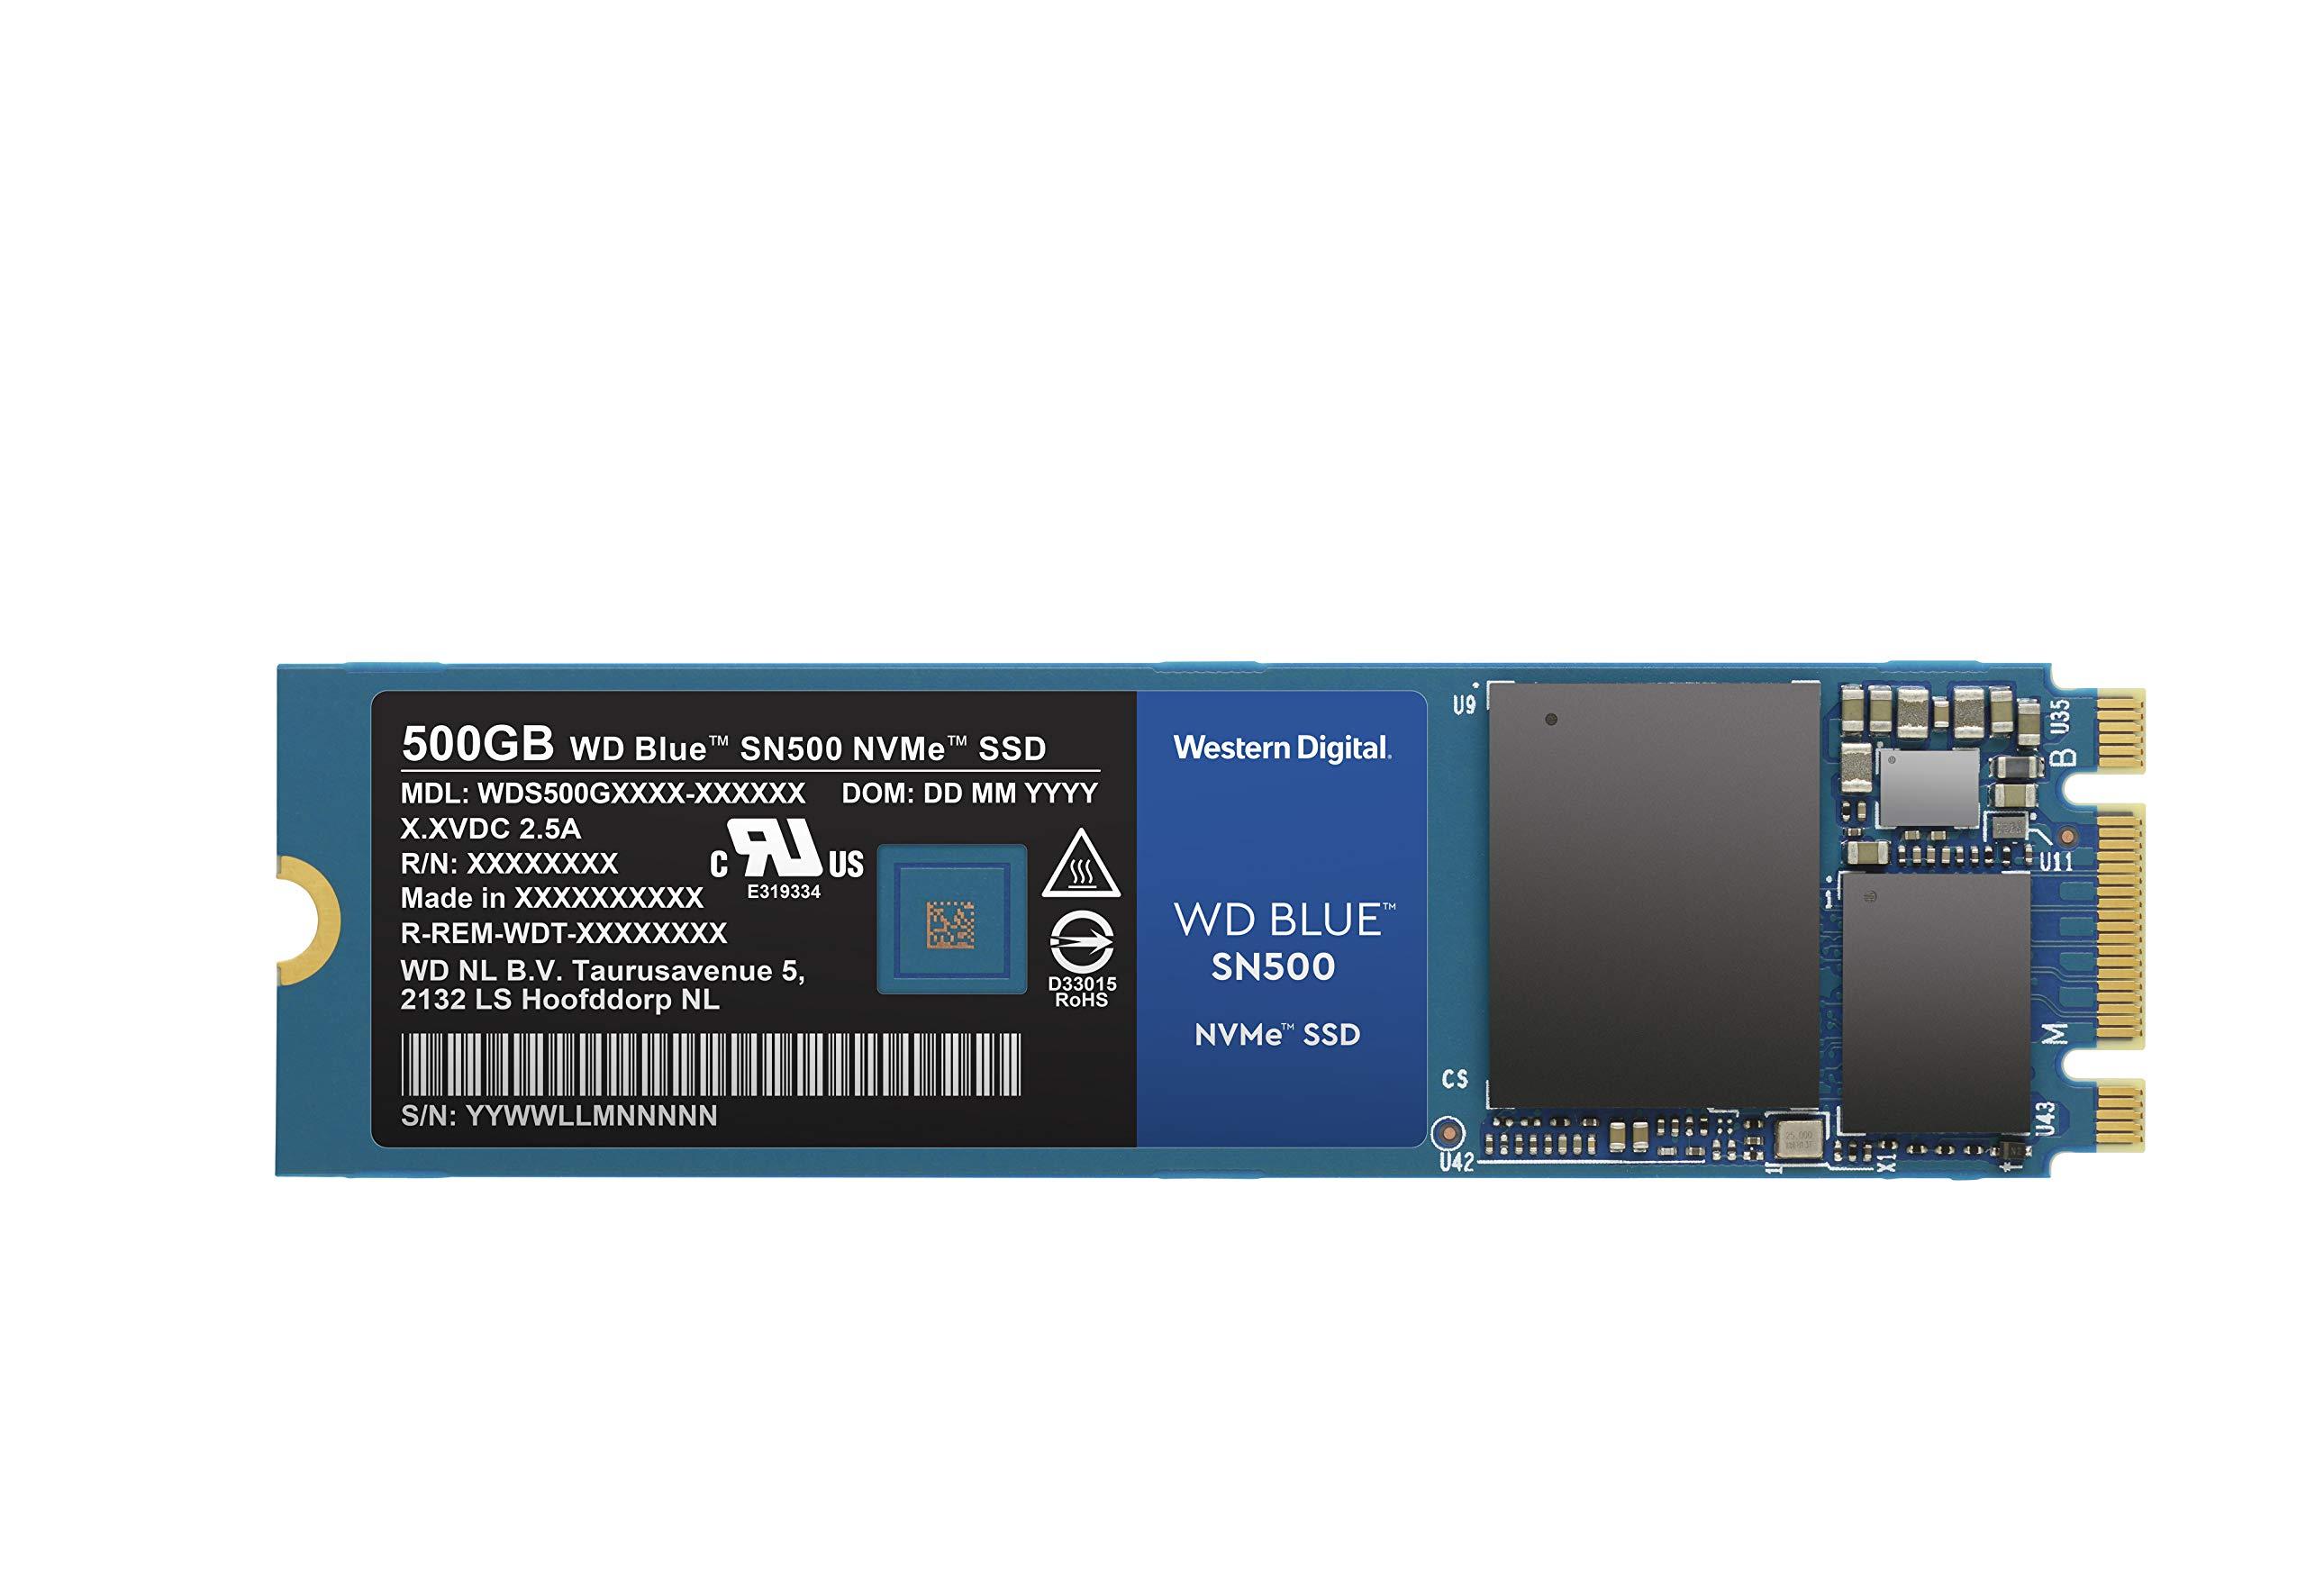 WD Blue SN500 500GB NVMe Internal SSD - Gen3 PCIe, M.2 2280, 3D NAND, Up to 1700 MB/s - WDS500G1B0C by Western Digital